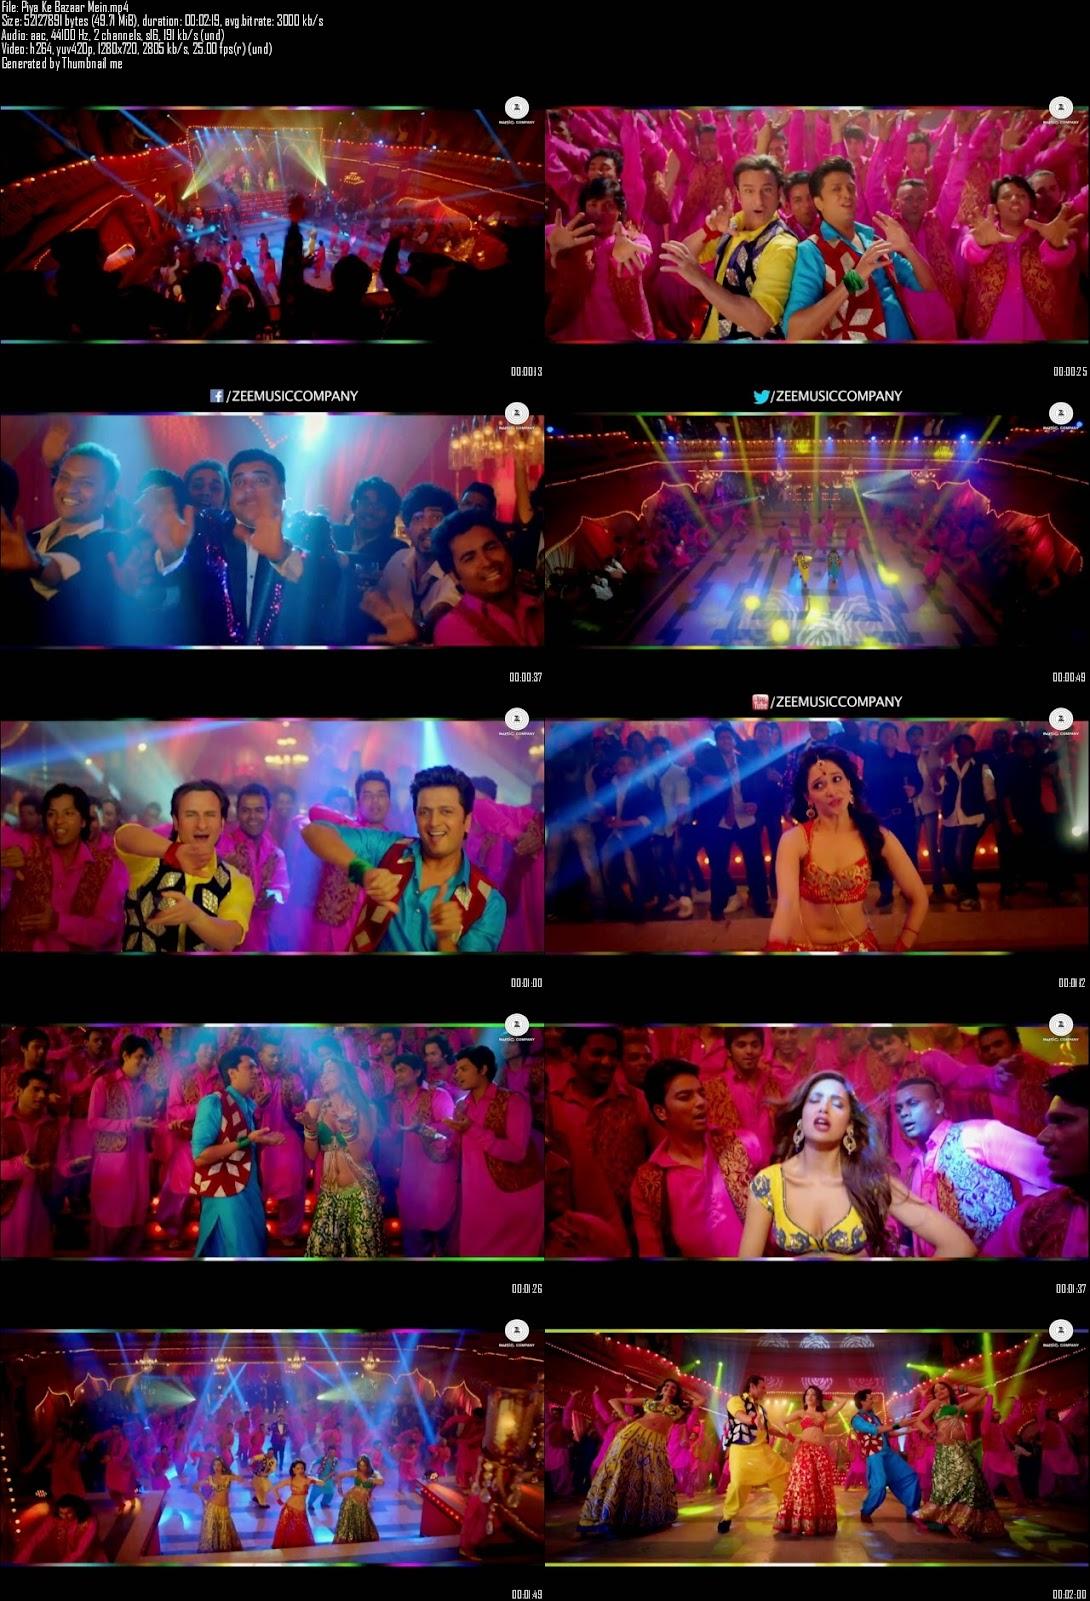 Mediafire Resumable Download Link For Video Song Piya Ke Bazaar Mein - Humshakals (2014)